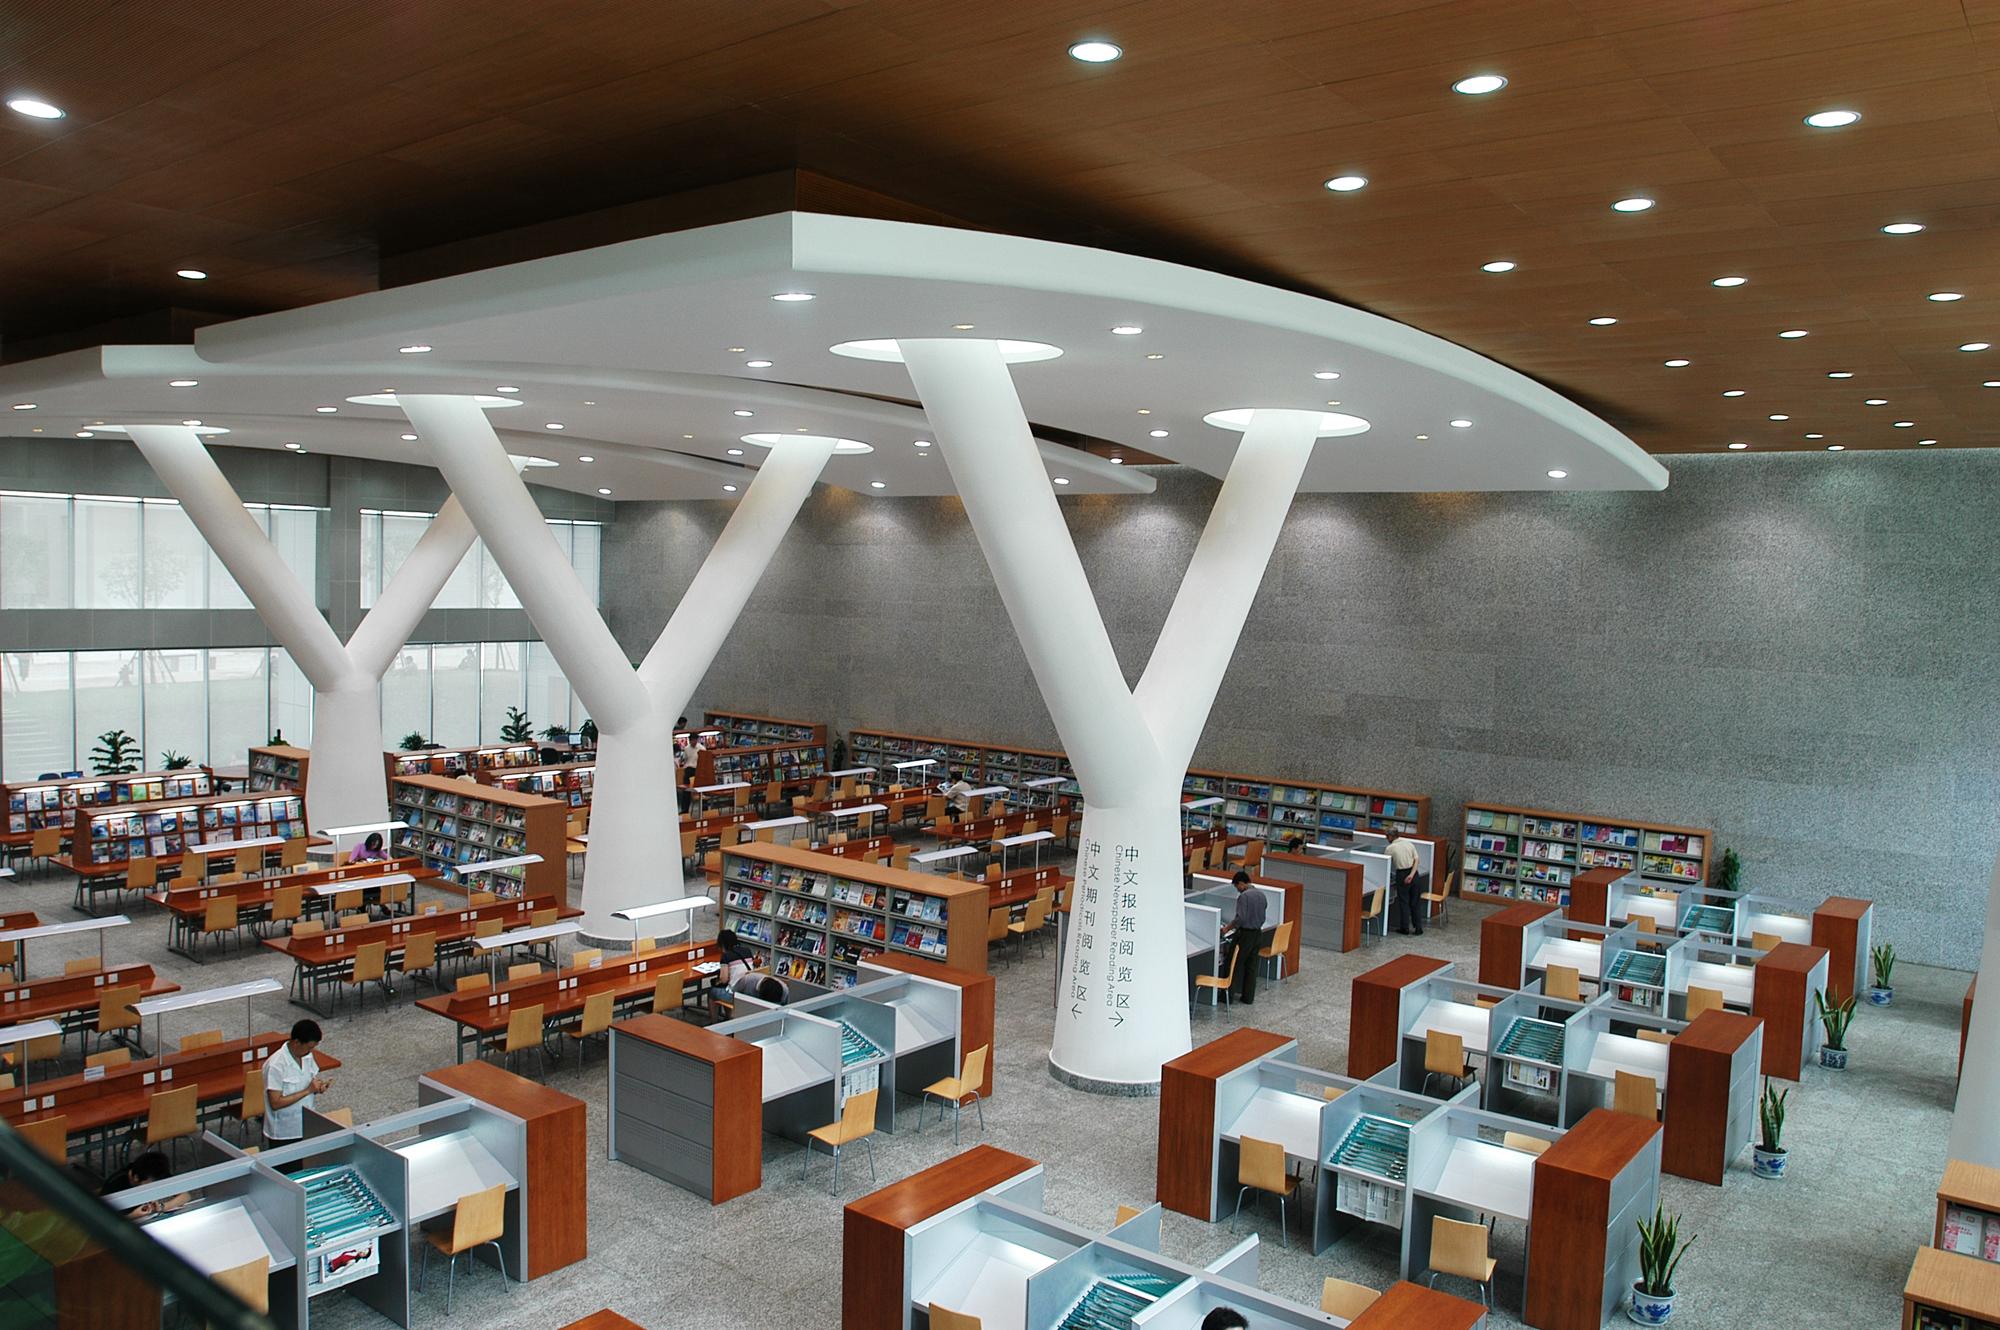 Chongqing Library_20030_Int Reading Room_MR.jpg